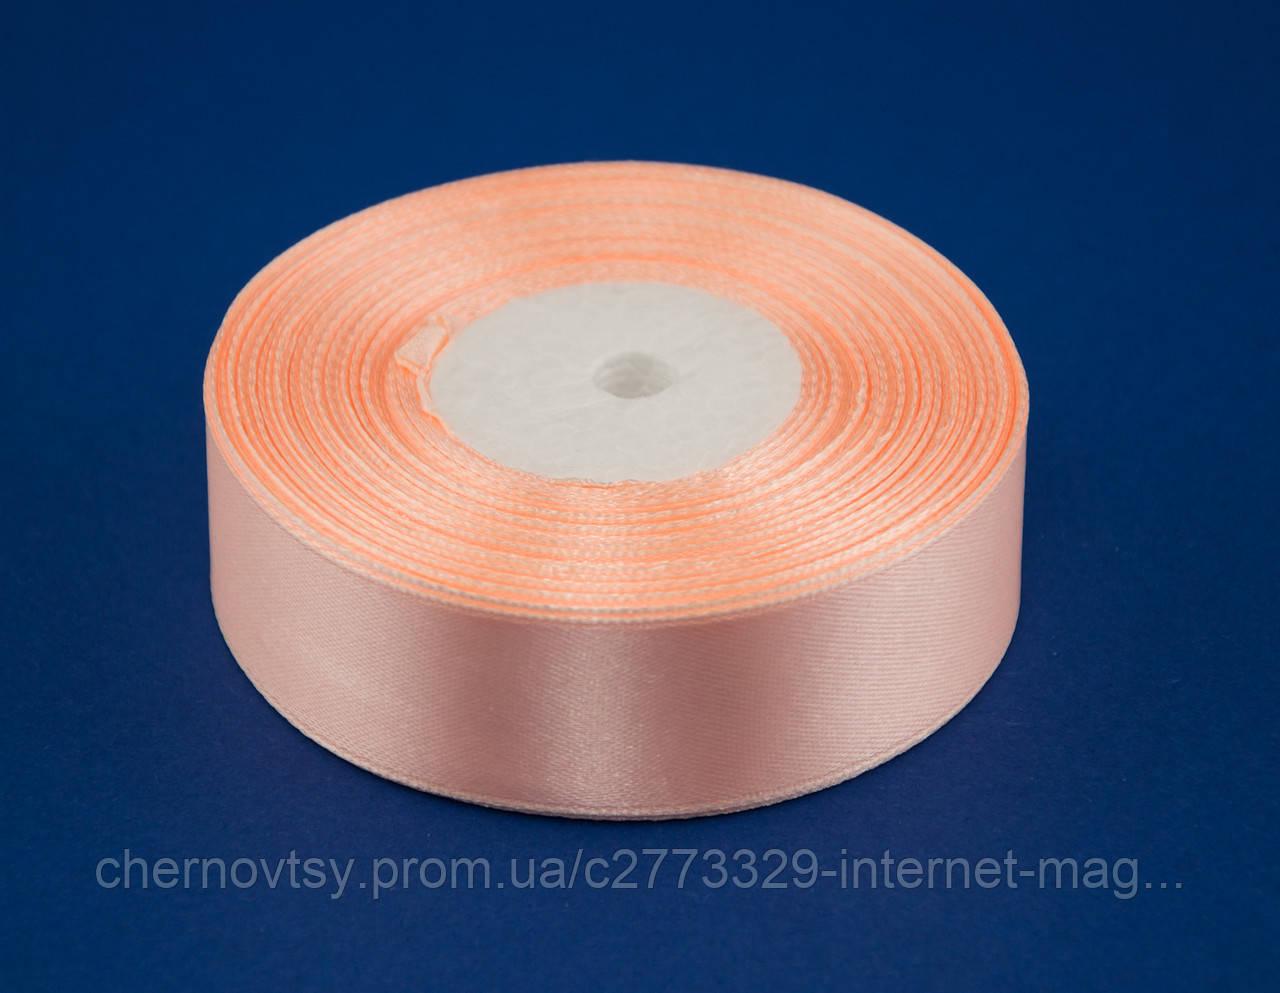 Лента атлас 5 см, 33 м, № 07 нежно персиковая